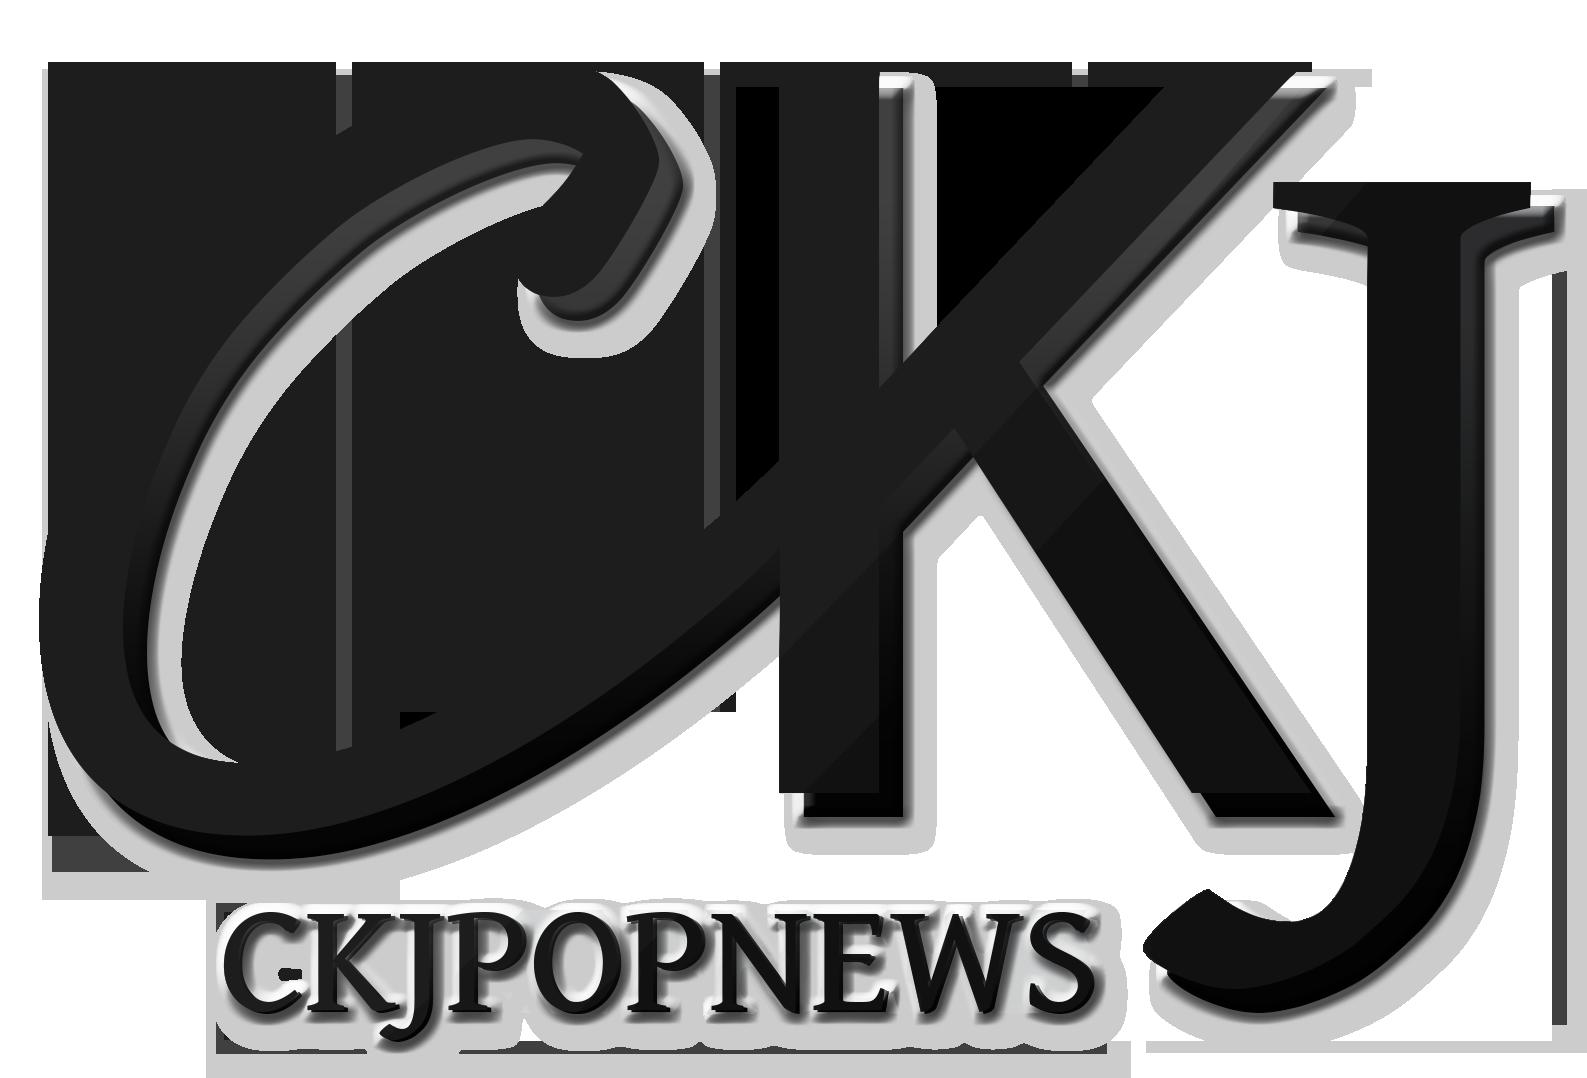 Ckjpopnews